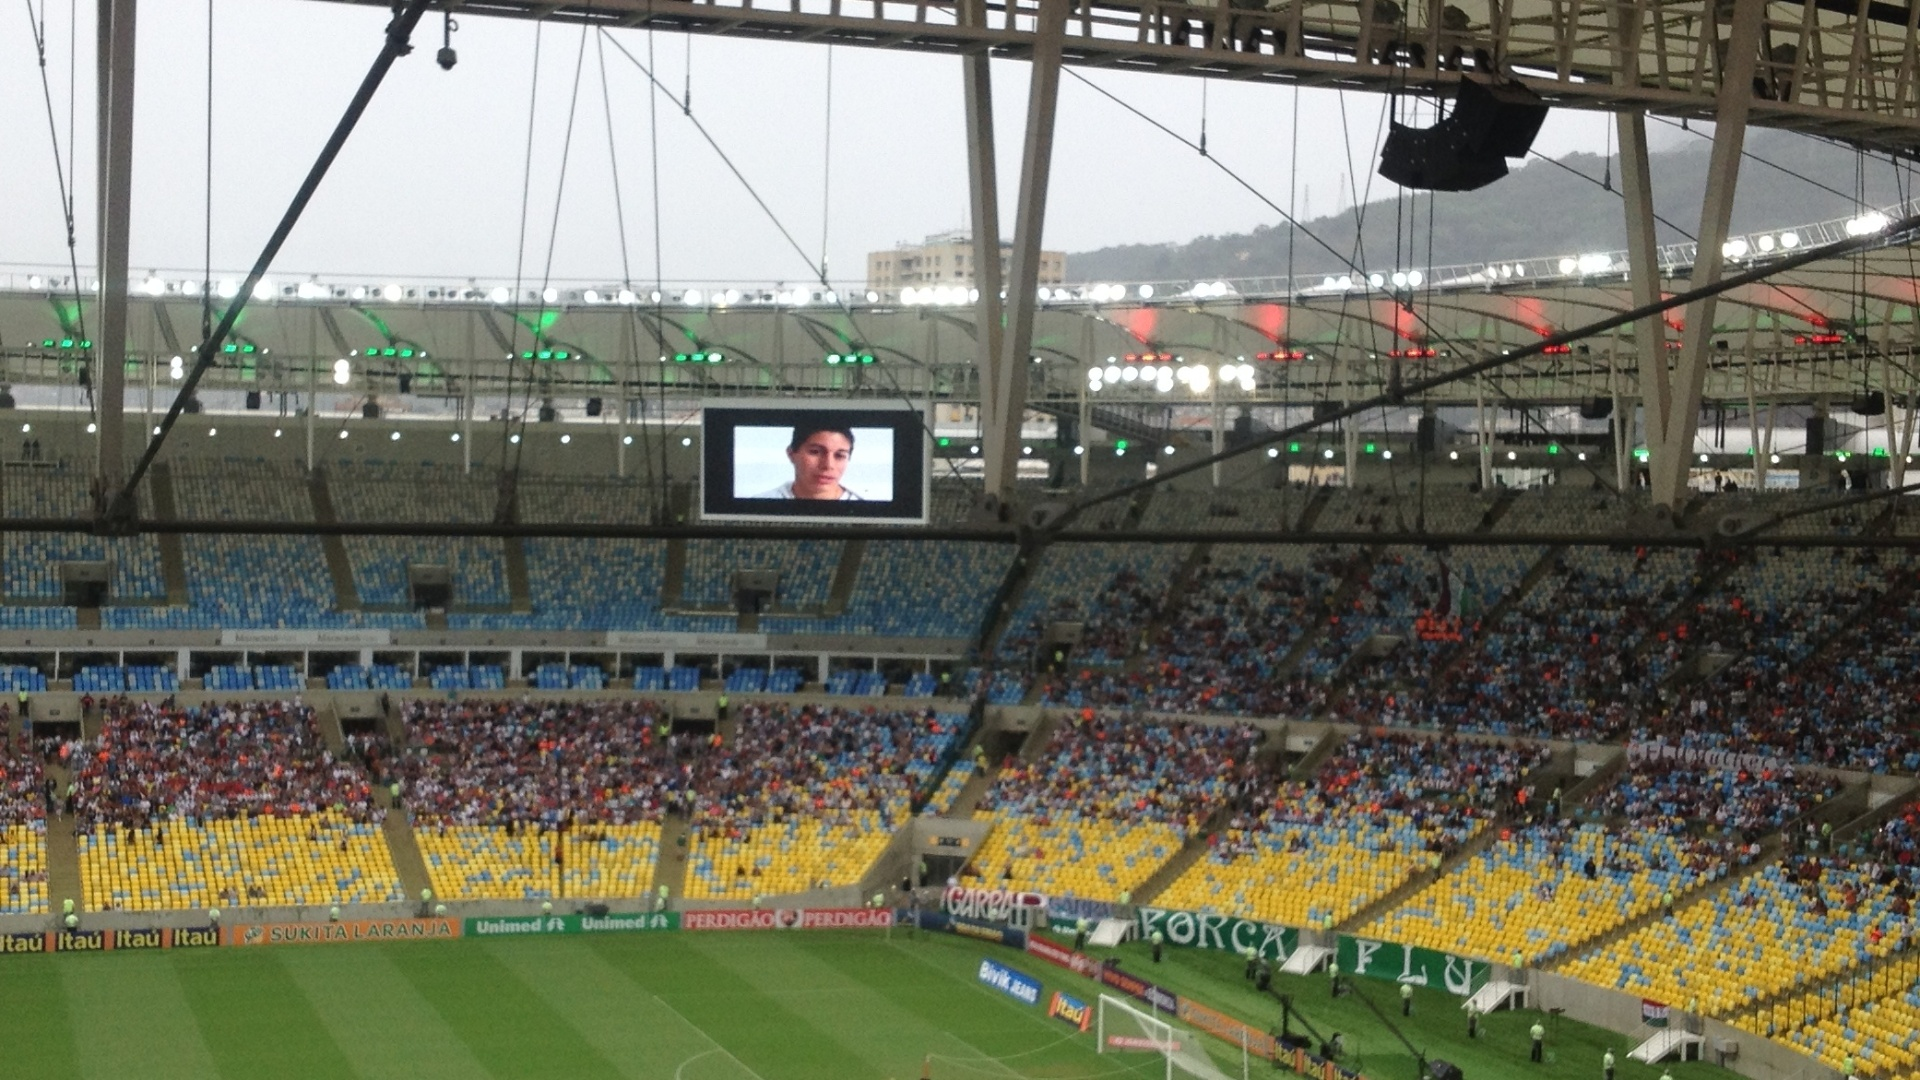 Conca foi anunciado pelo Fluminense no telão do Maracanã e levou torcedores ao delírio